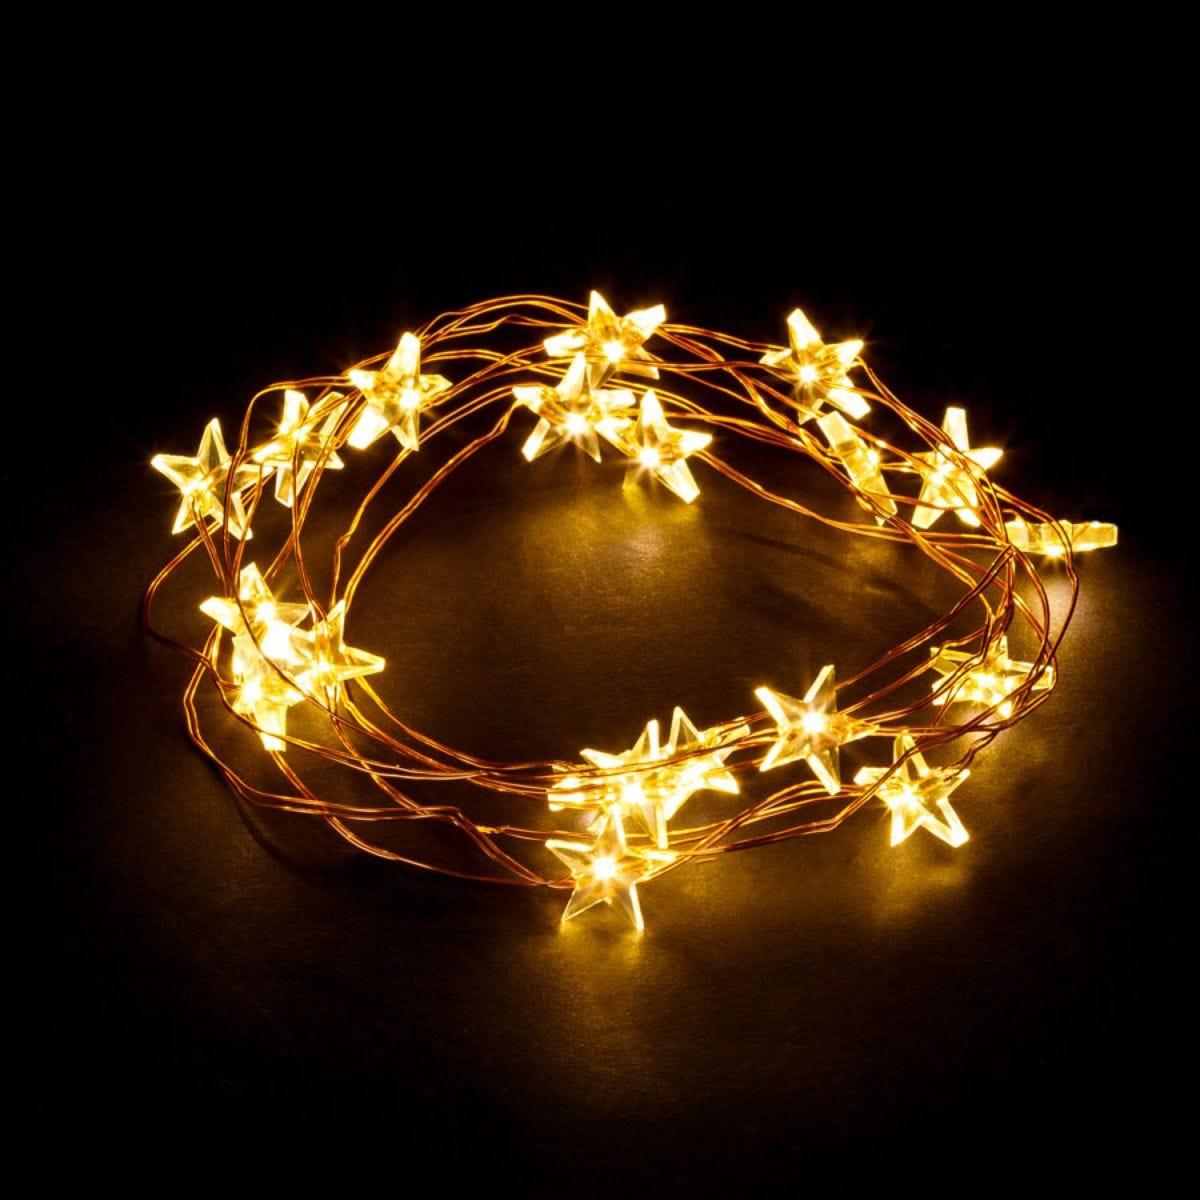 Robert Dyas 20 String Star Lights - Warm White